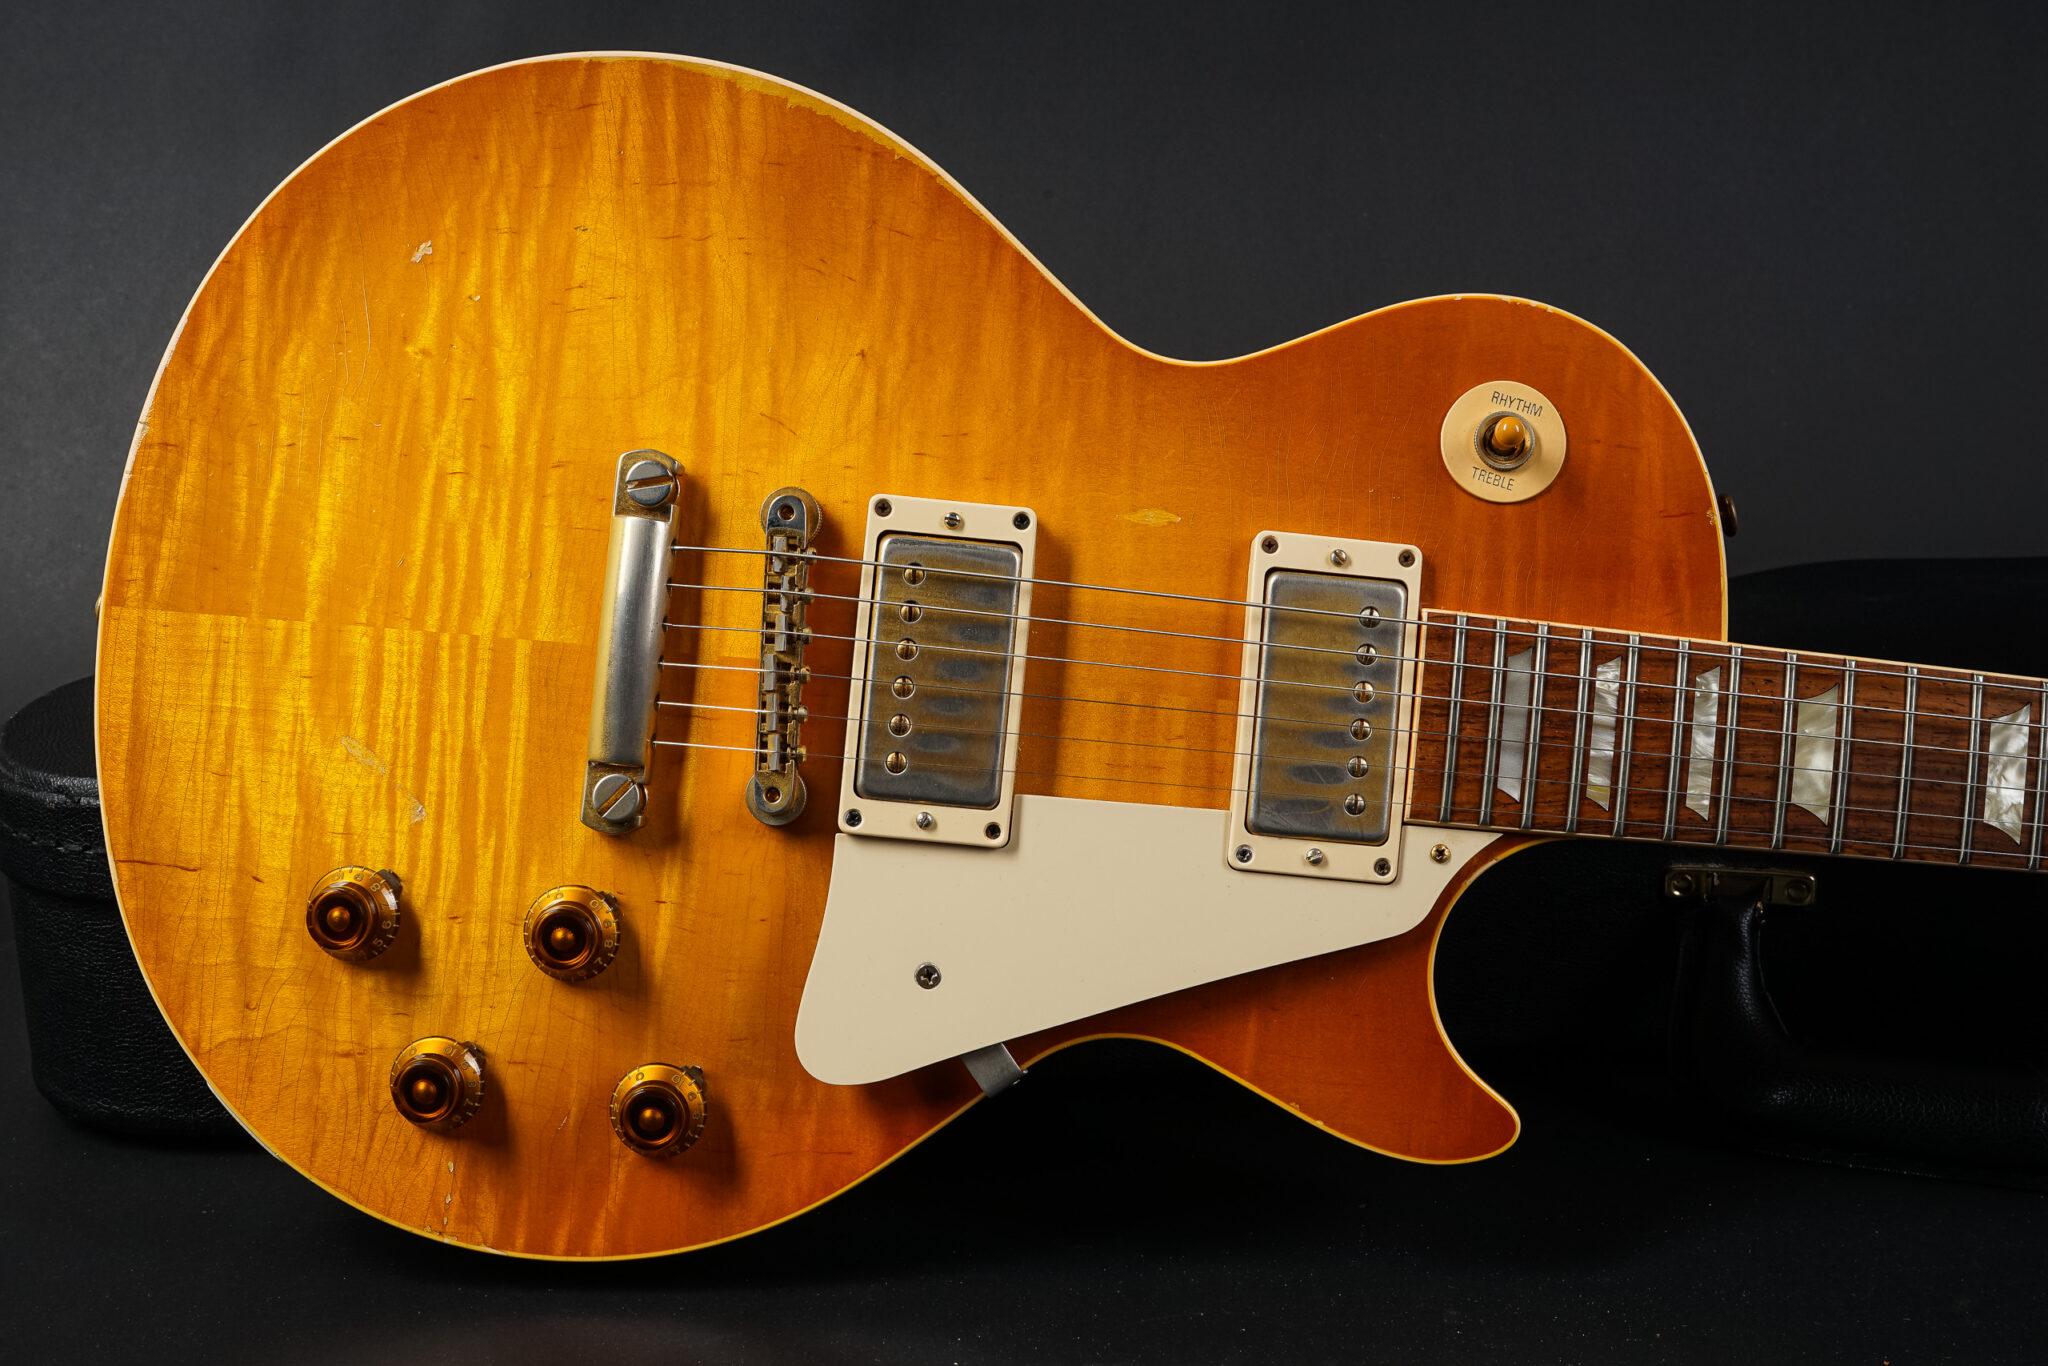 https://guitarpoint.de/app/uploads/products/2002-gibson-les-paul-gary-rossington/2001-Gibson-Gary.-Rossington-Les-Paul-GR125-10-2048x1366.jpg